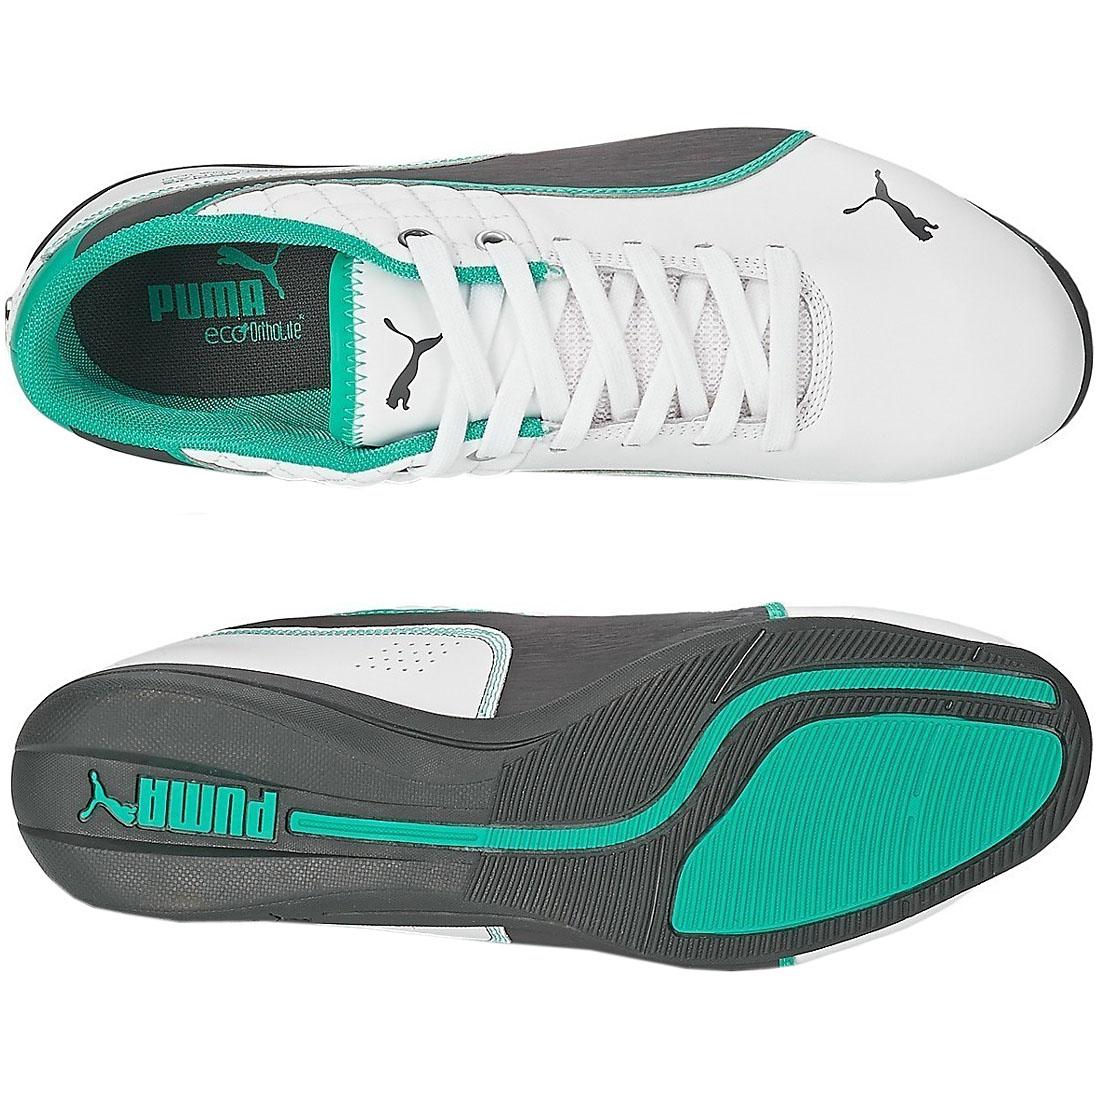 e7428c36214151 Puma Mercedes AMG Men s Shoes Mamgp Drift Cat 6 Petronas Sneaker ...